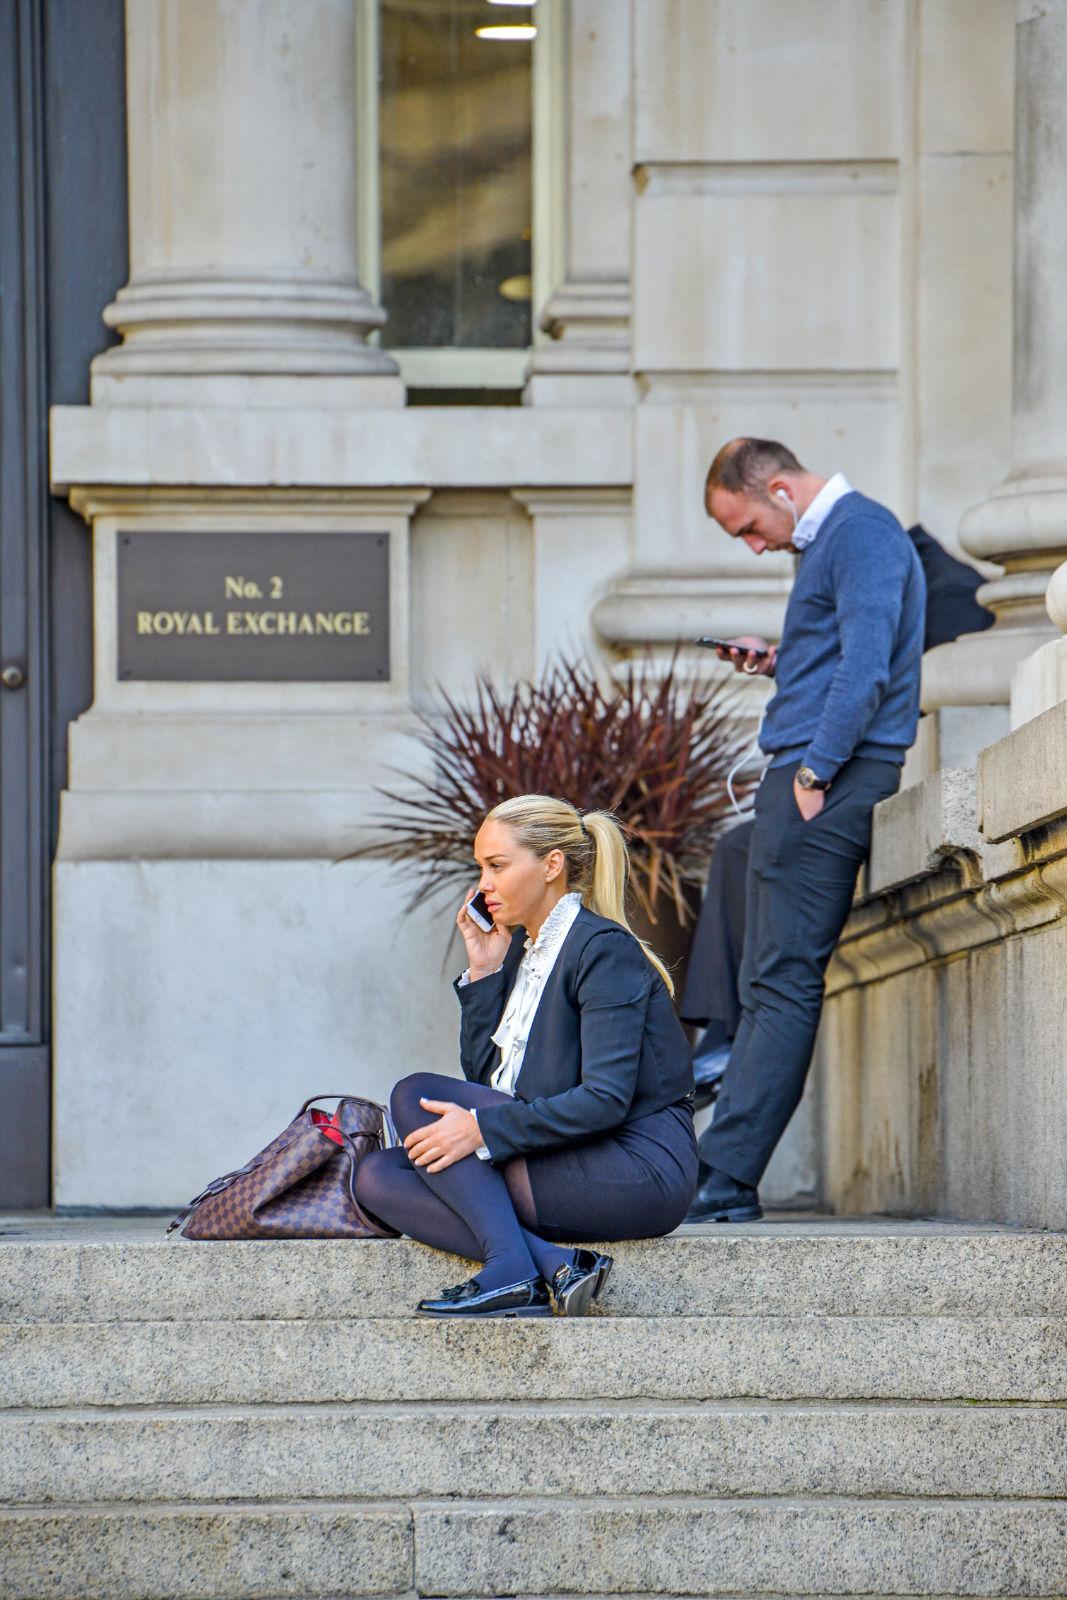 local london area photo royal exchange